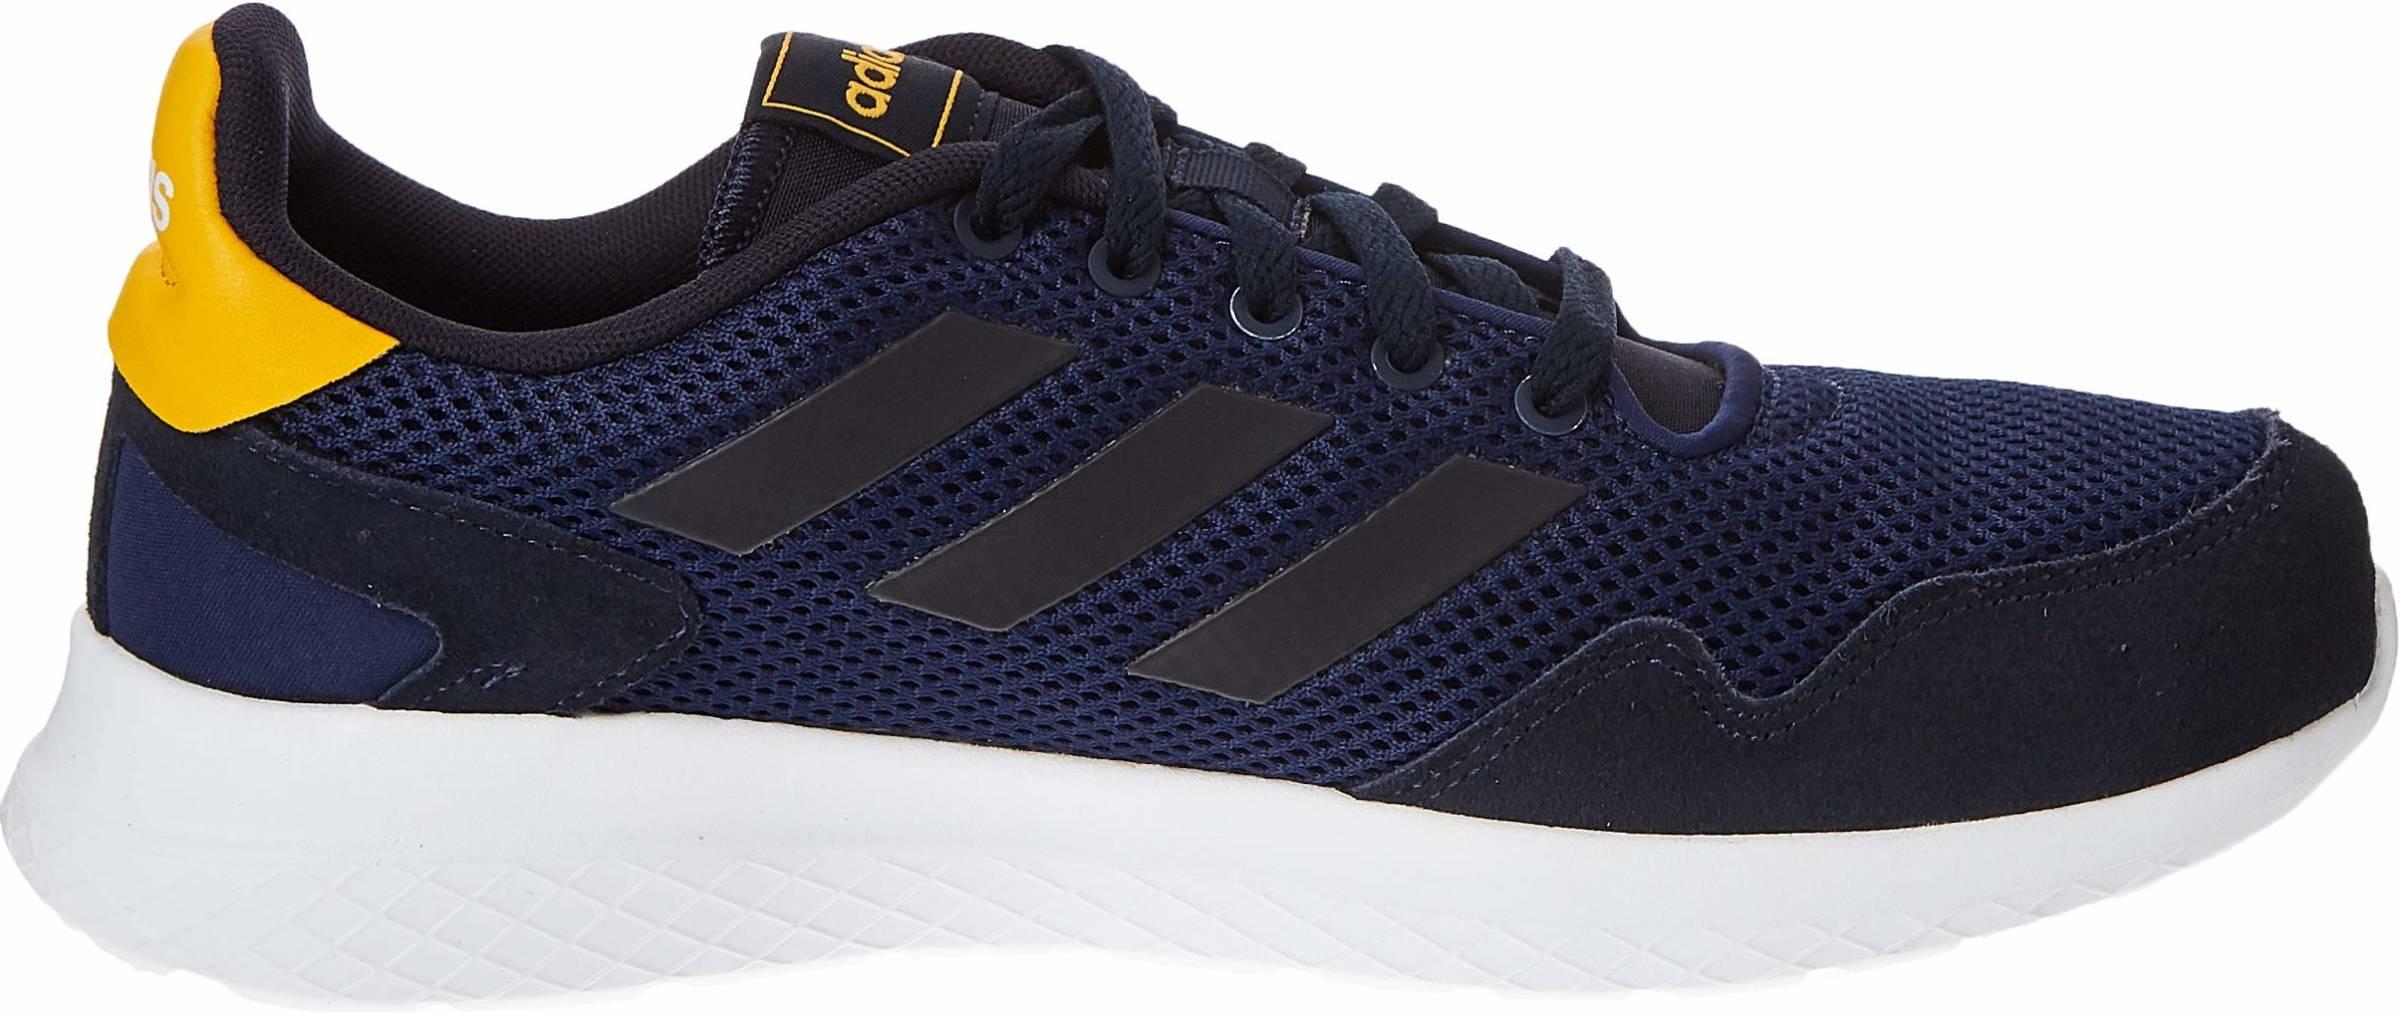 40 Adidas NEO sneakers - Save 49% | RunRepeat